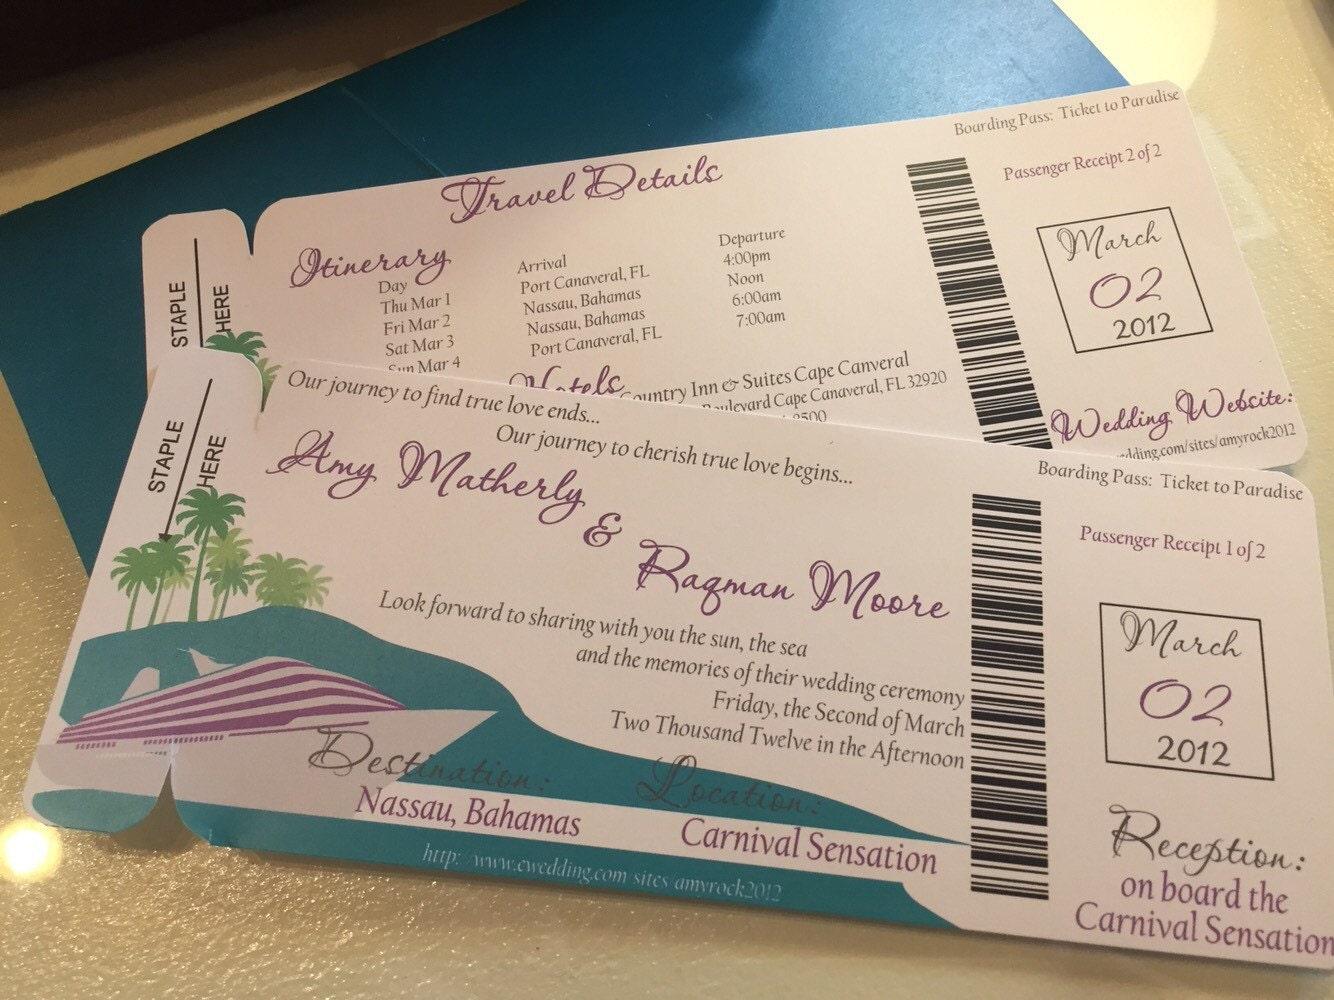 Boarding Pass Wedding Invitation: Cruise Wedding Invitation. Boarding Pass Wedding Invitation